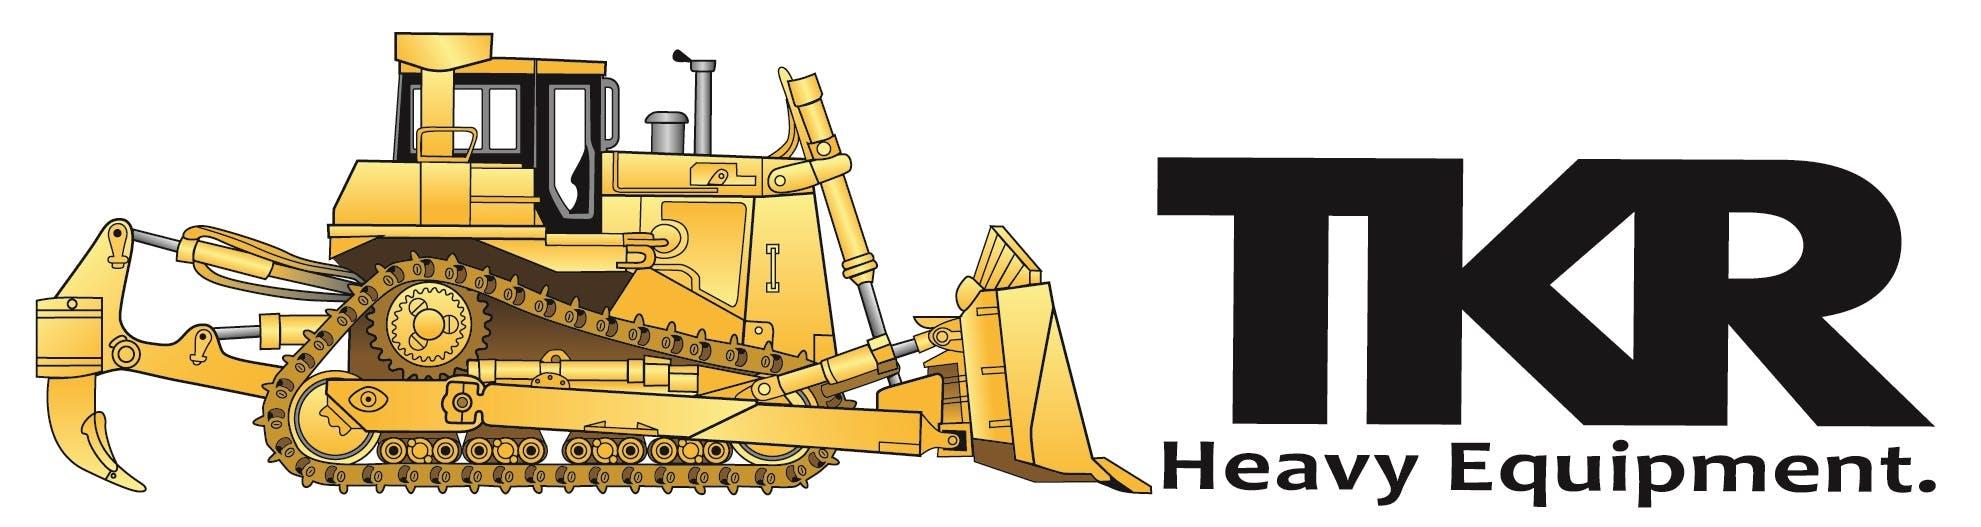 TKR Heavy Equipment Hire